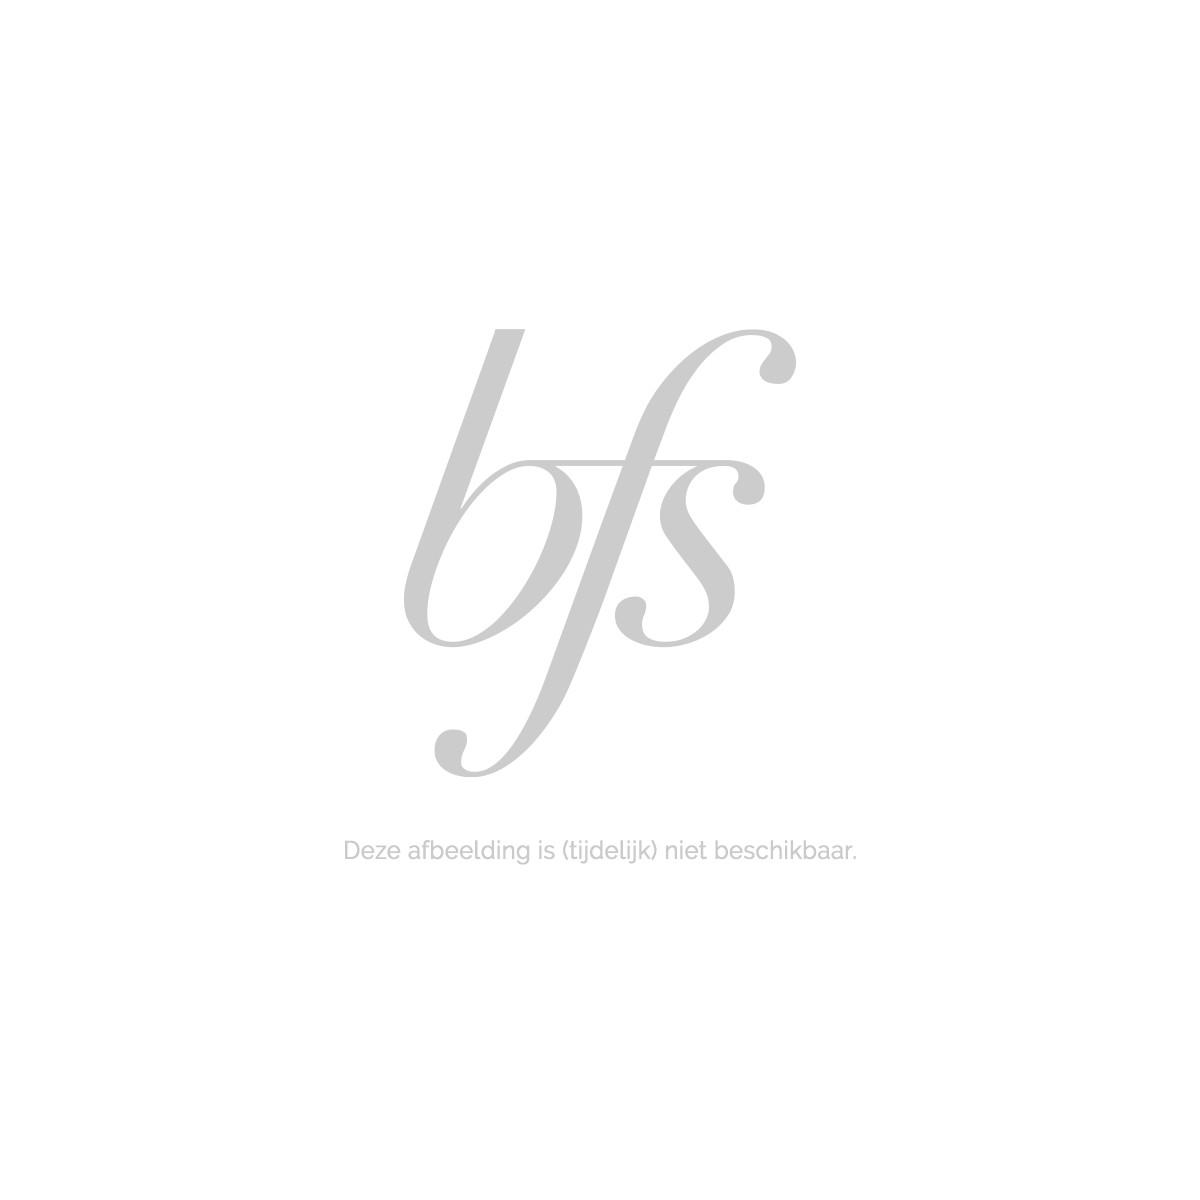 Alessandro Nsm Professional Manicure File 100/100 1 Piece